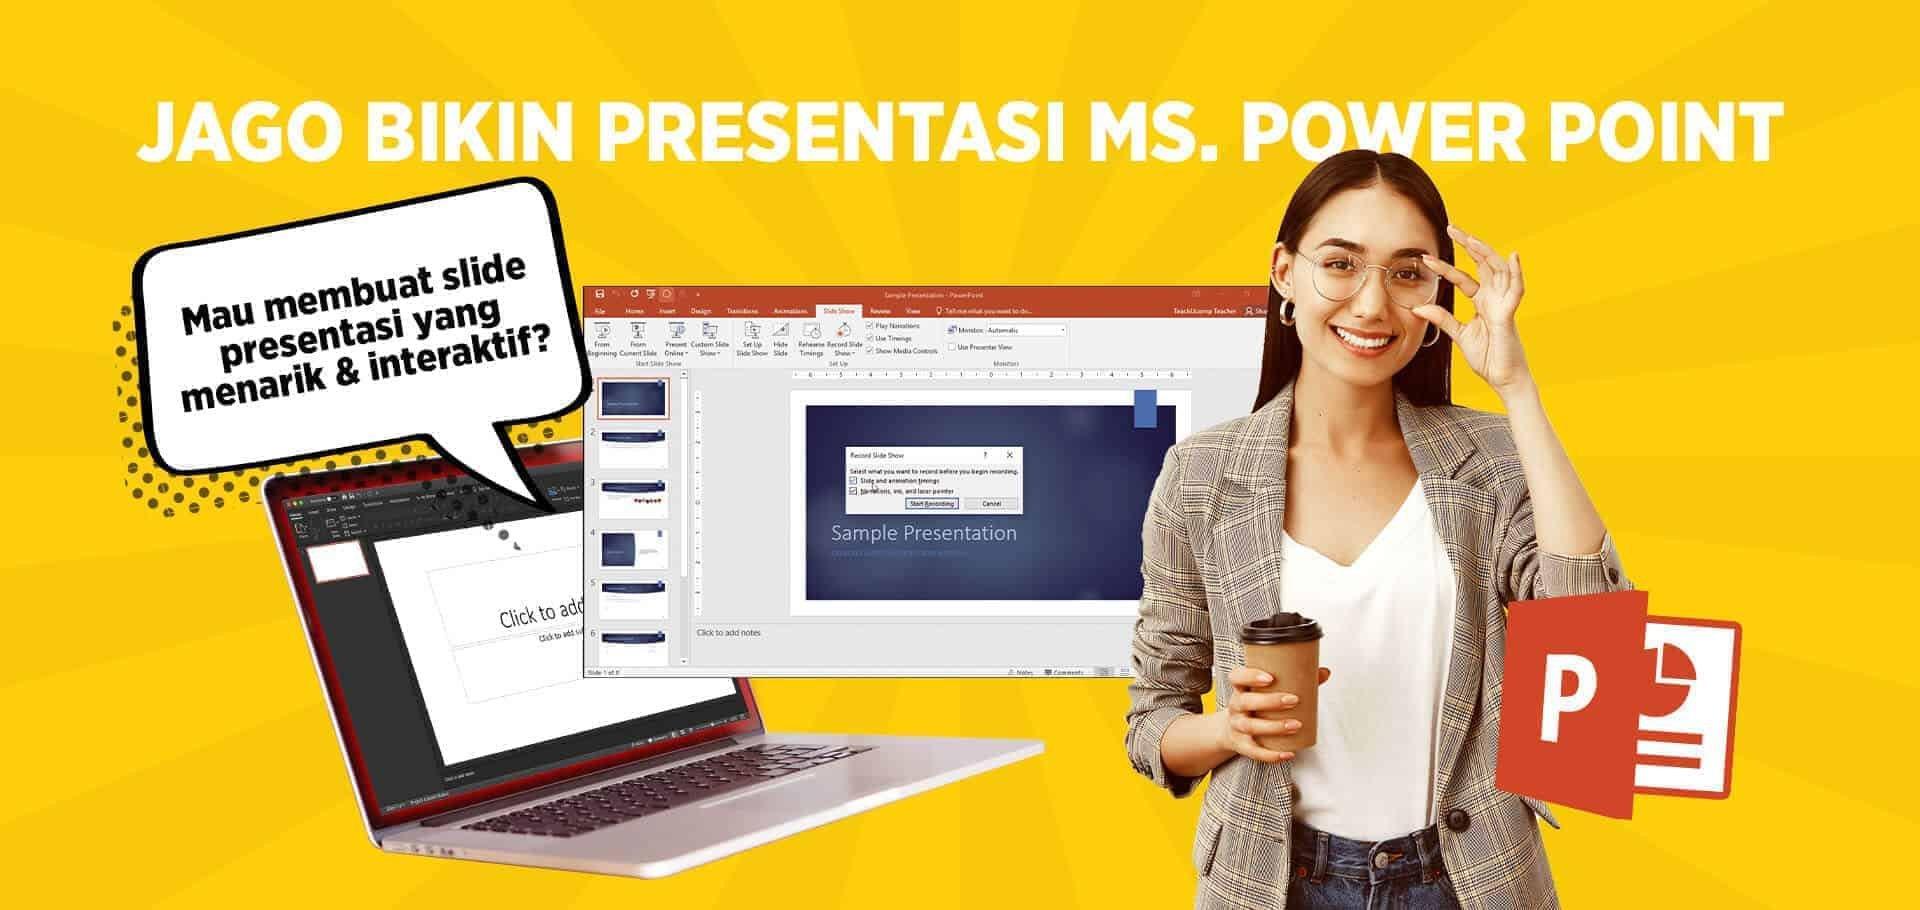 Jago Bikin Presentasi Ms. Power Point